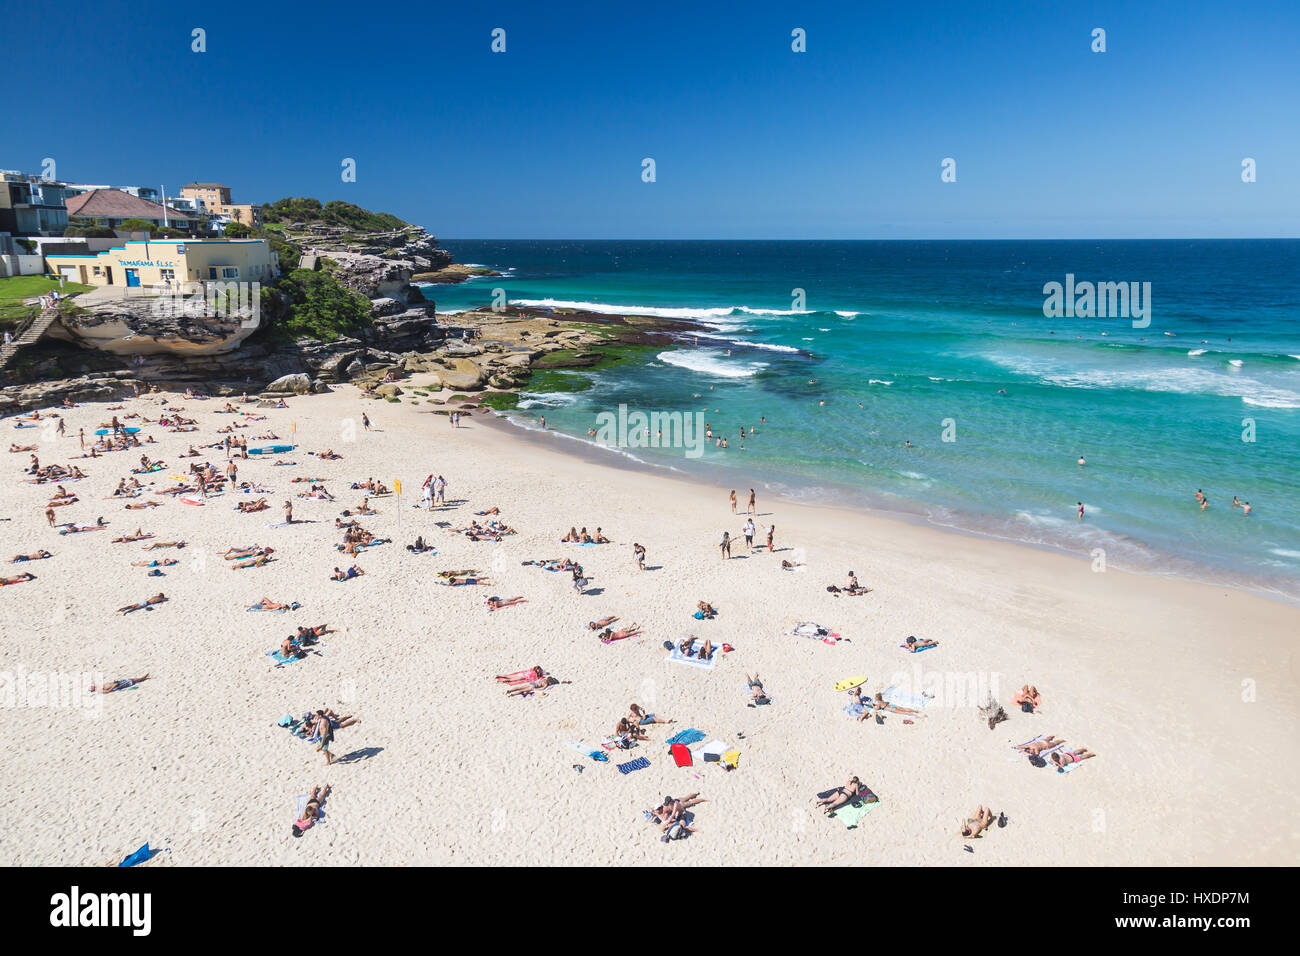 A beautiful autumn day at Tamarama Beach, Sydney, Australia. - Stock Image